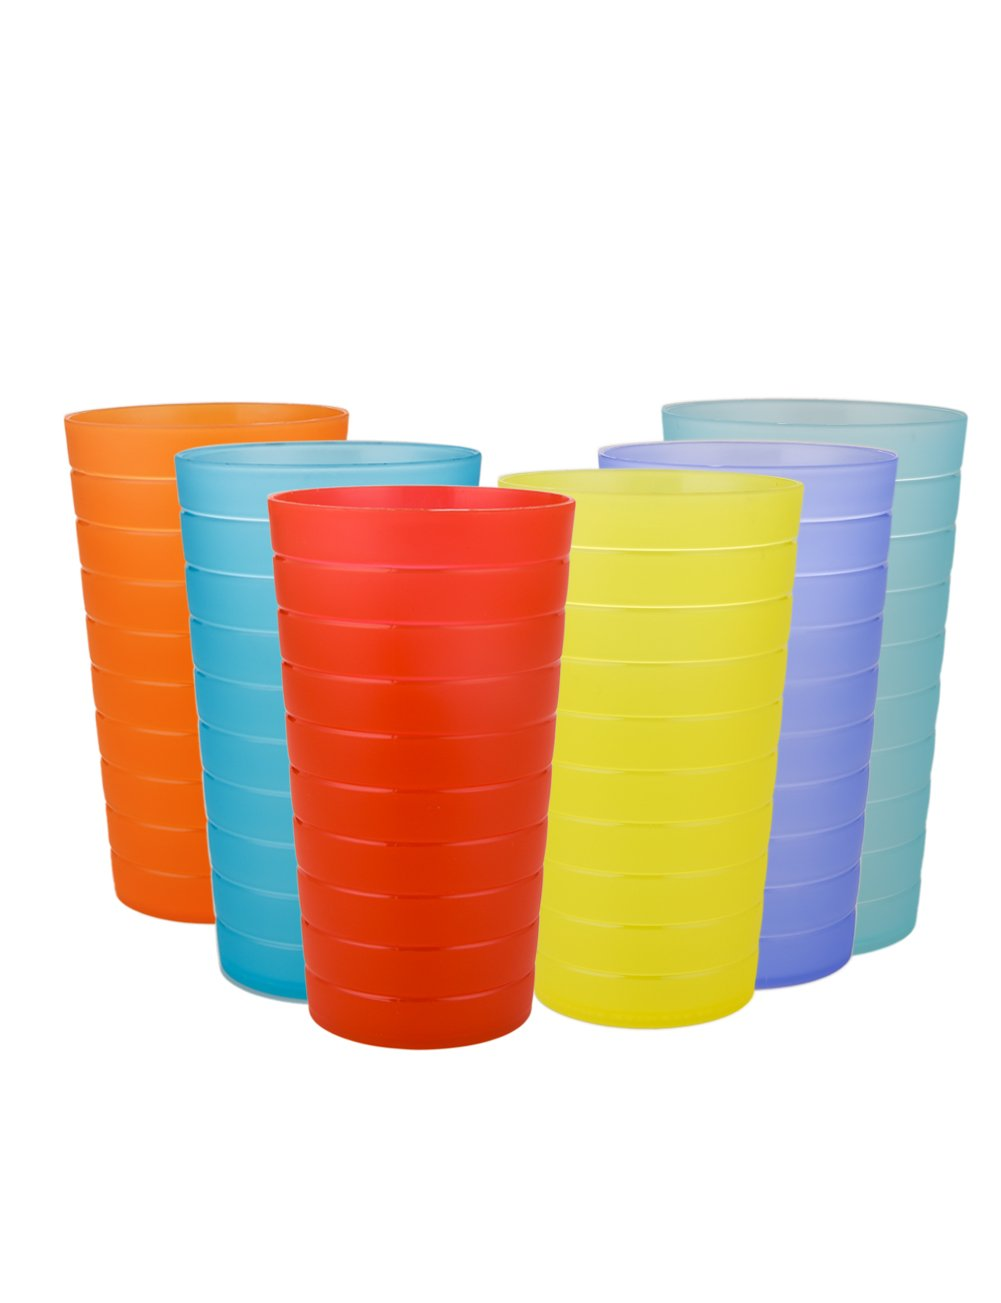 AYT Plastic Tumblers Drinking Glasses Set of 12 | Break Resistant 22 oz Plastic Cups | 6 Assorted Colors Restaurant Quality | BPA Free